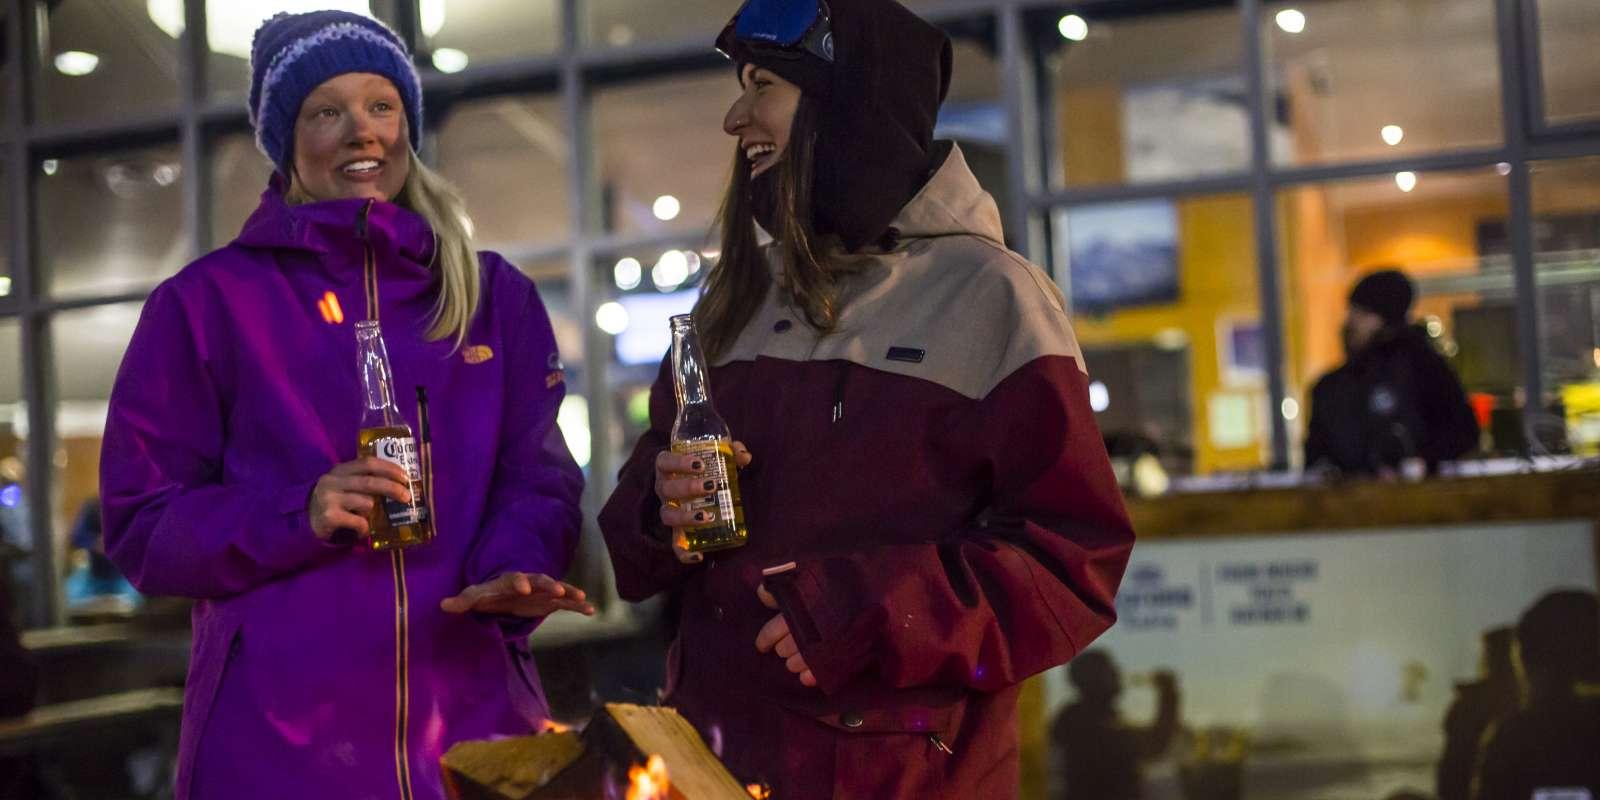 Coronet Peak night ski and beverages